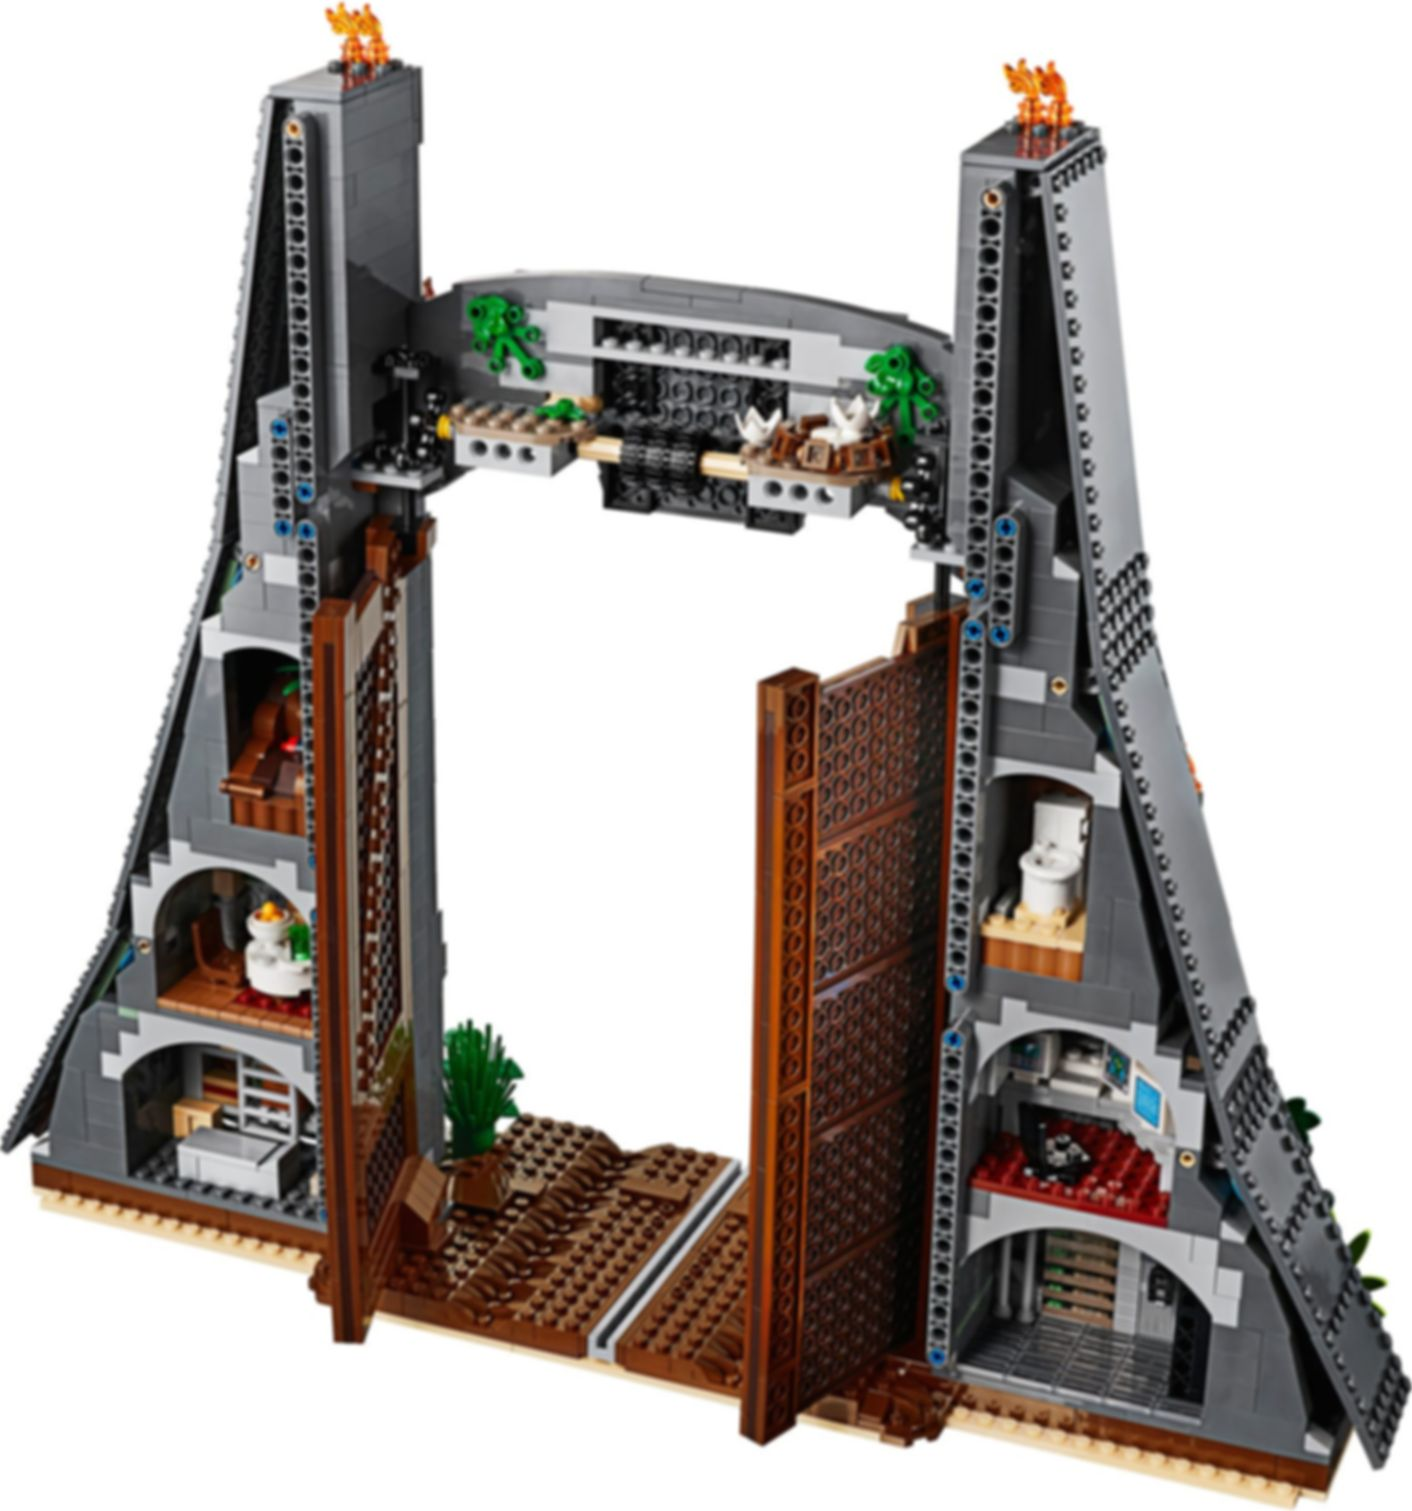 LEGO® Jurassic World Jurassic Park: T. rex Rampage components